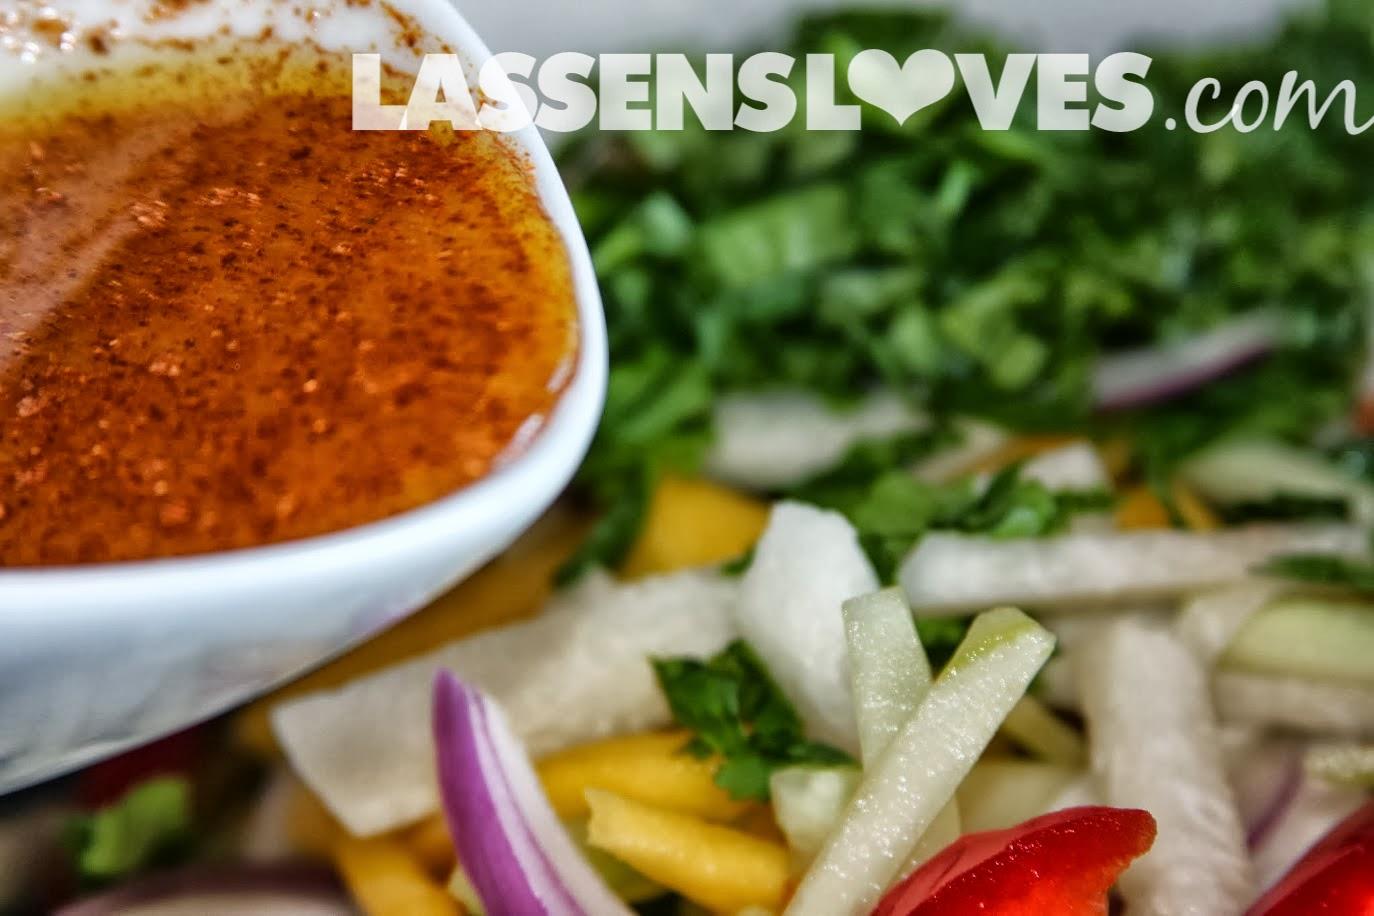 organic+jicama, Lassen's, lassensloves.com, jicama+recipe, jicama+salad